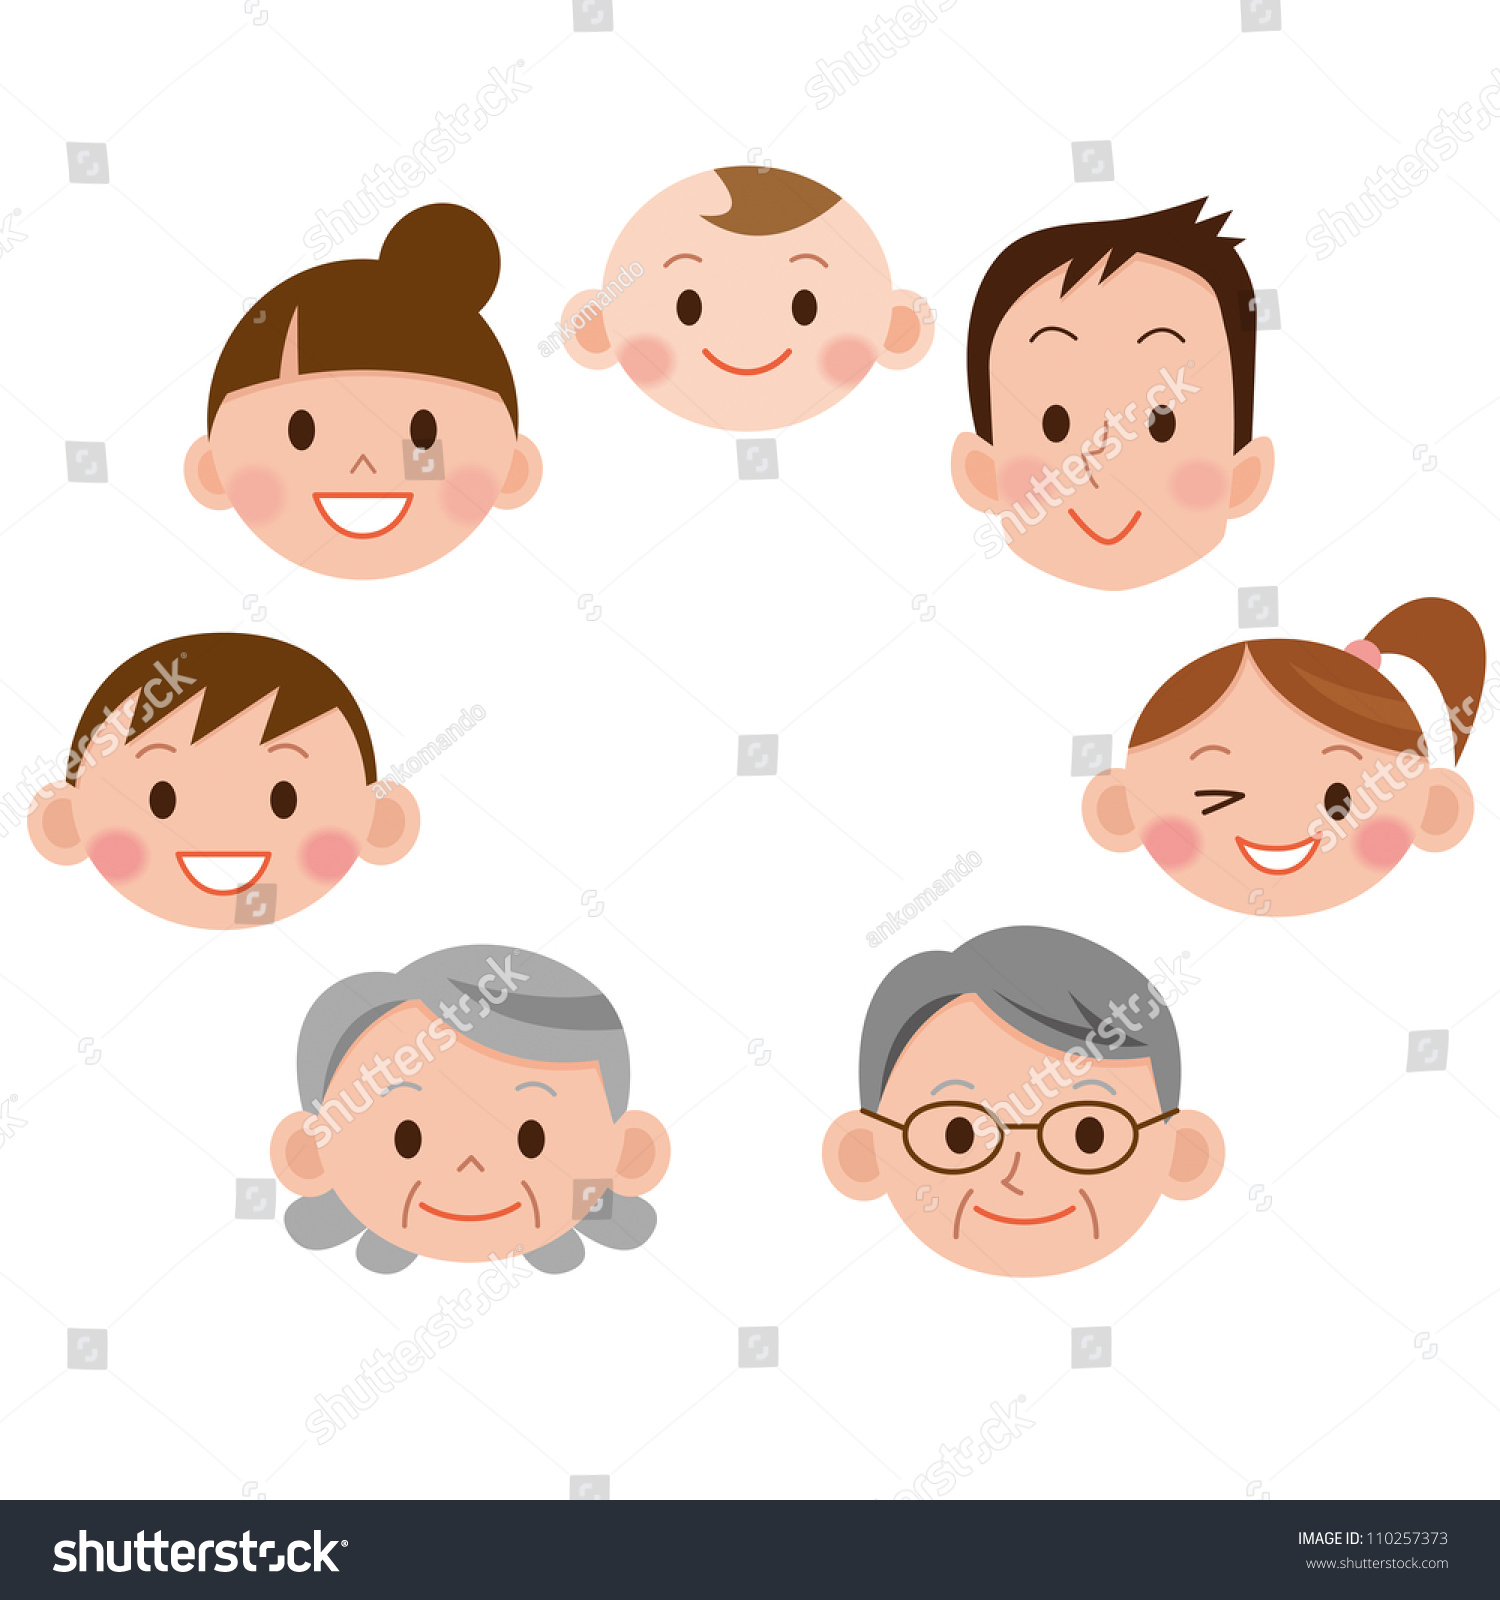 cartoon family face icons stock illustration 110257373